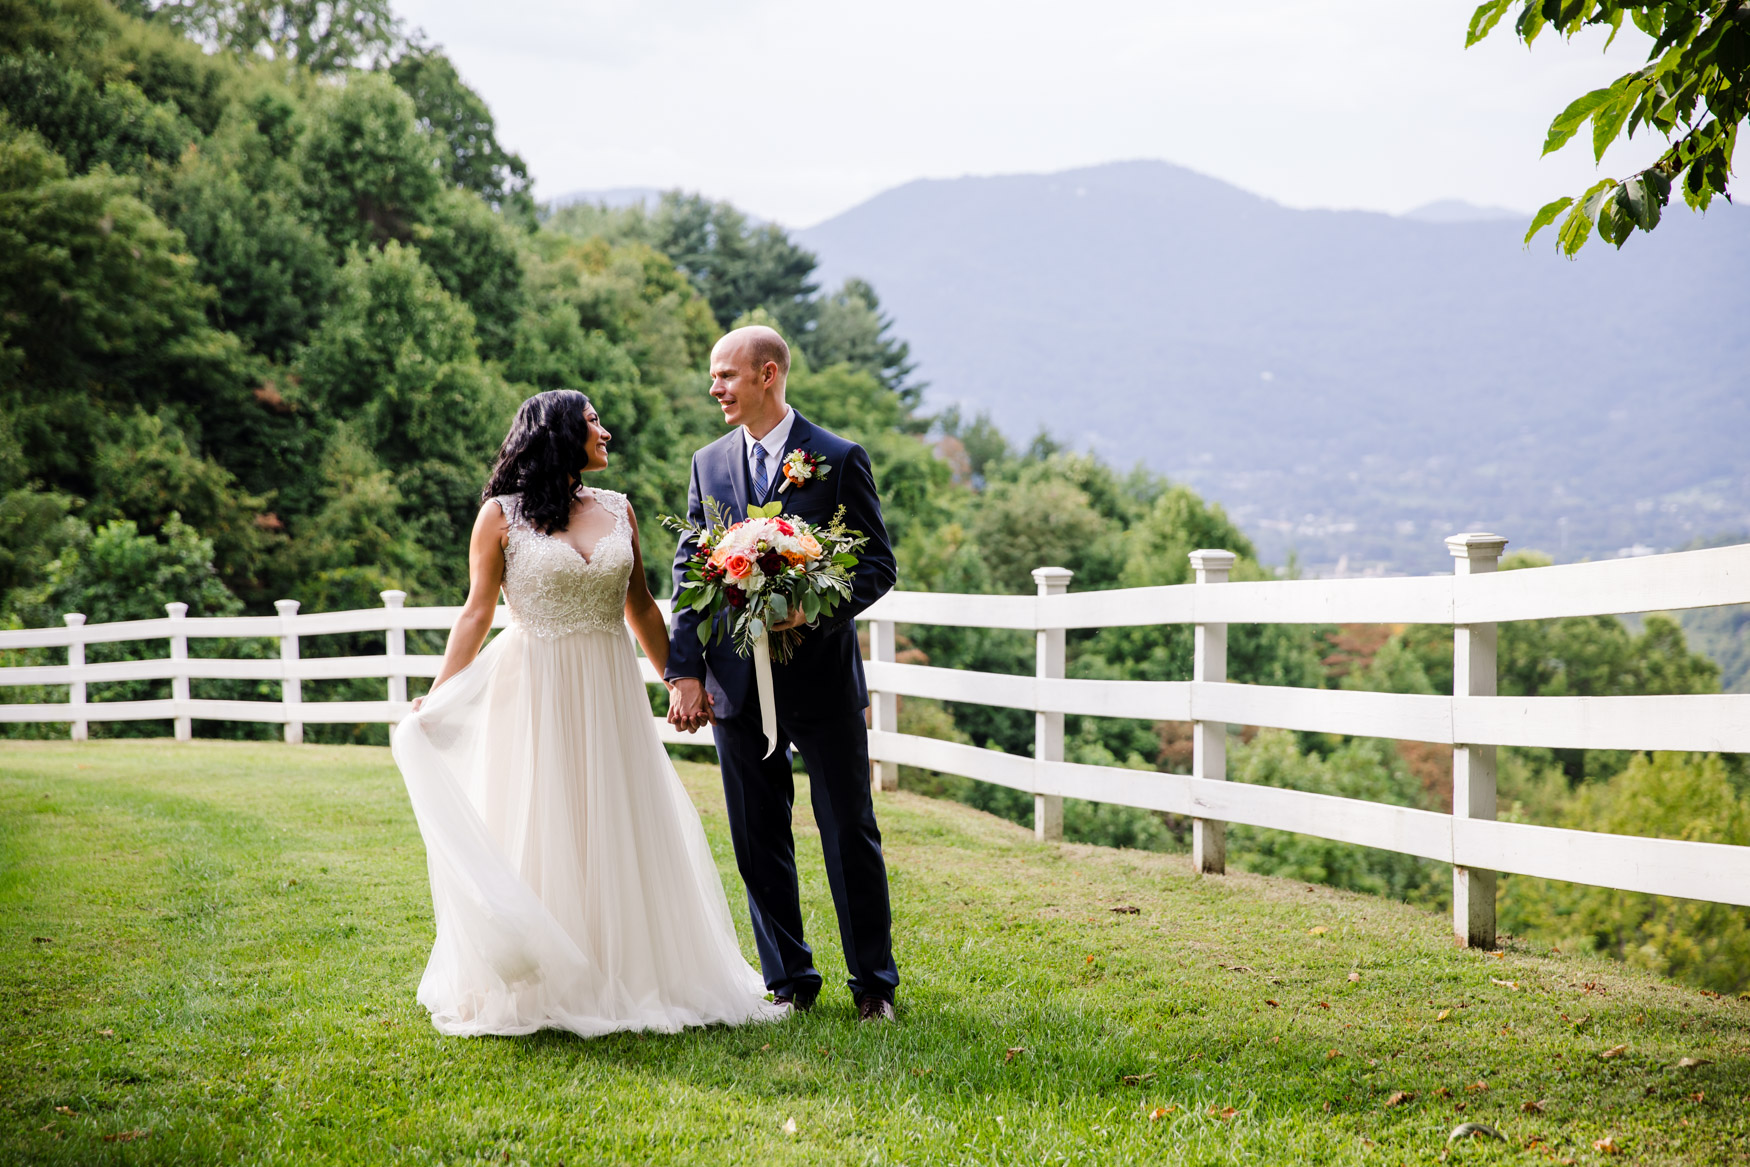 Couples Portrait Waynesville NC Wedding Photography Inn at Tranquility Farm